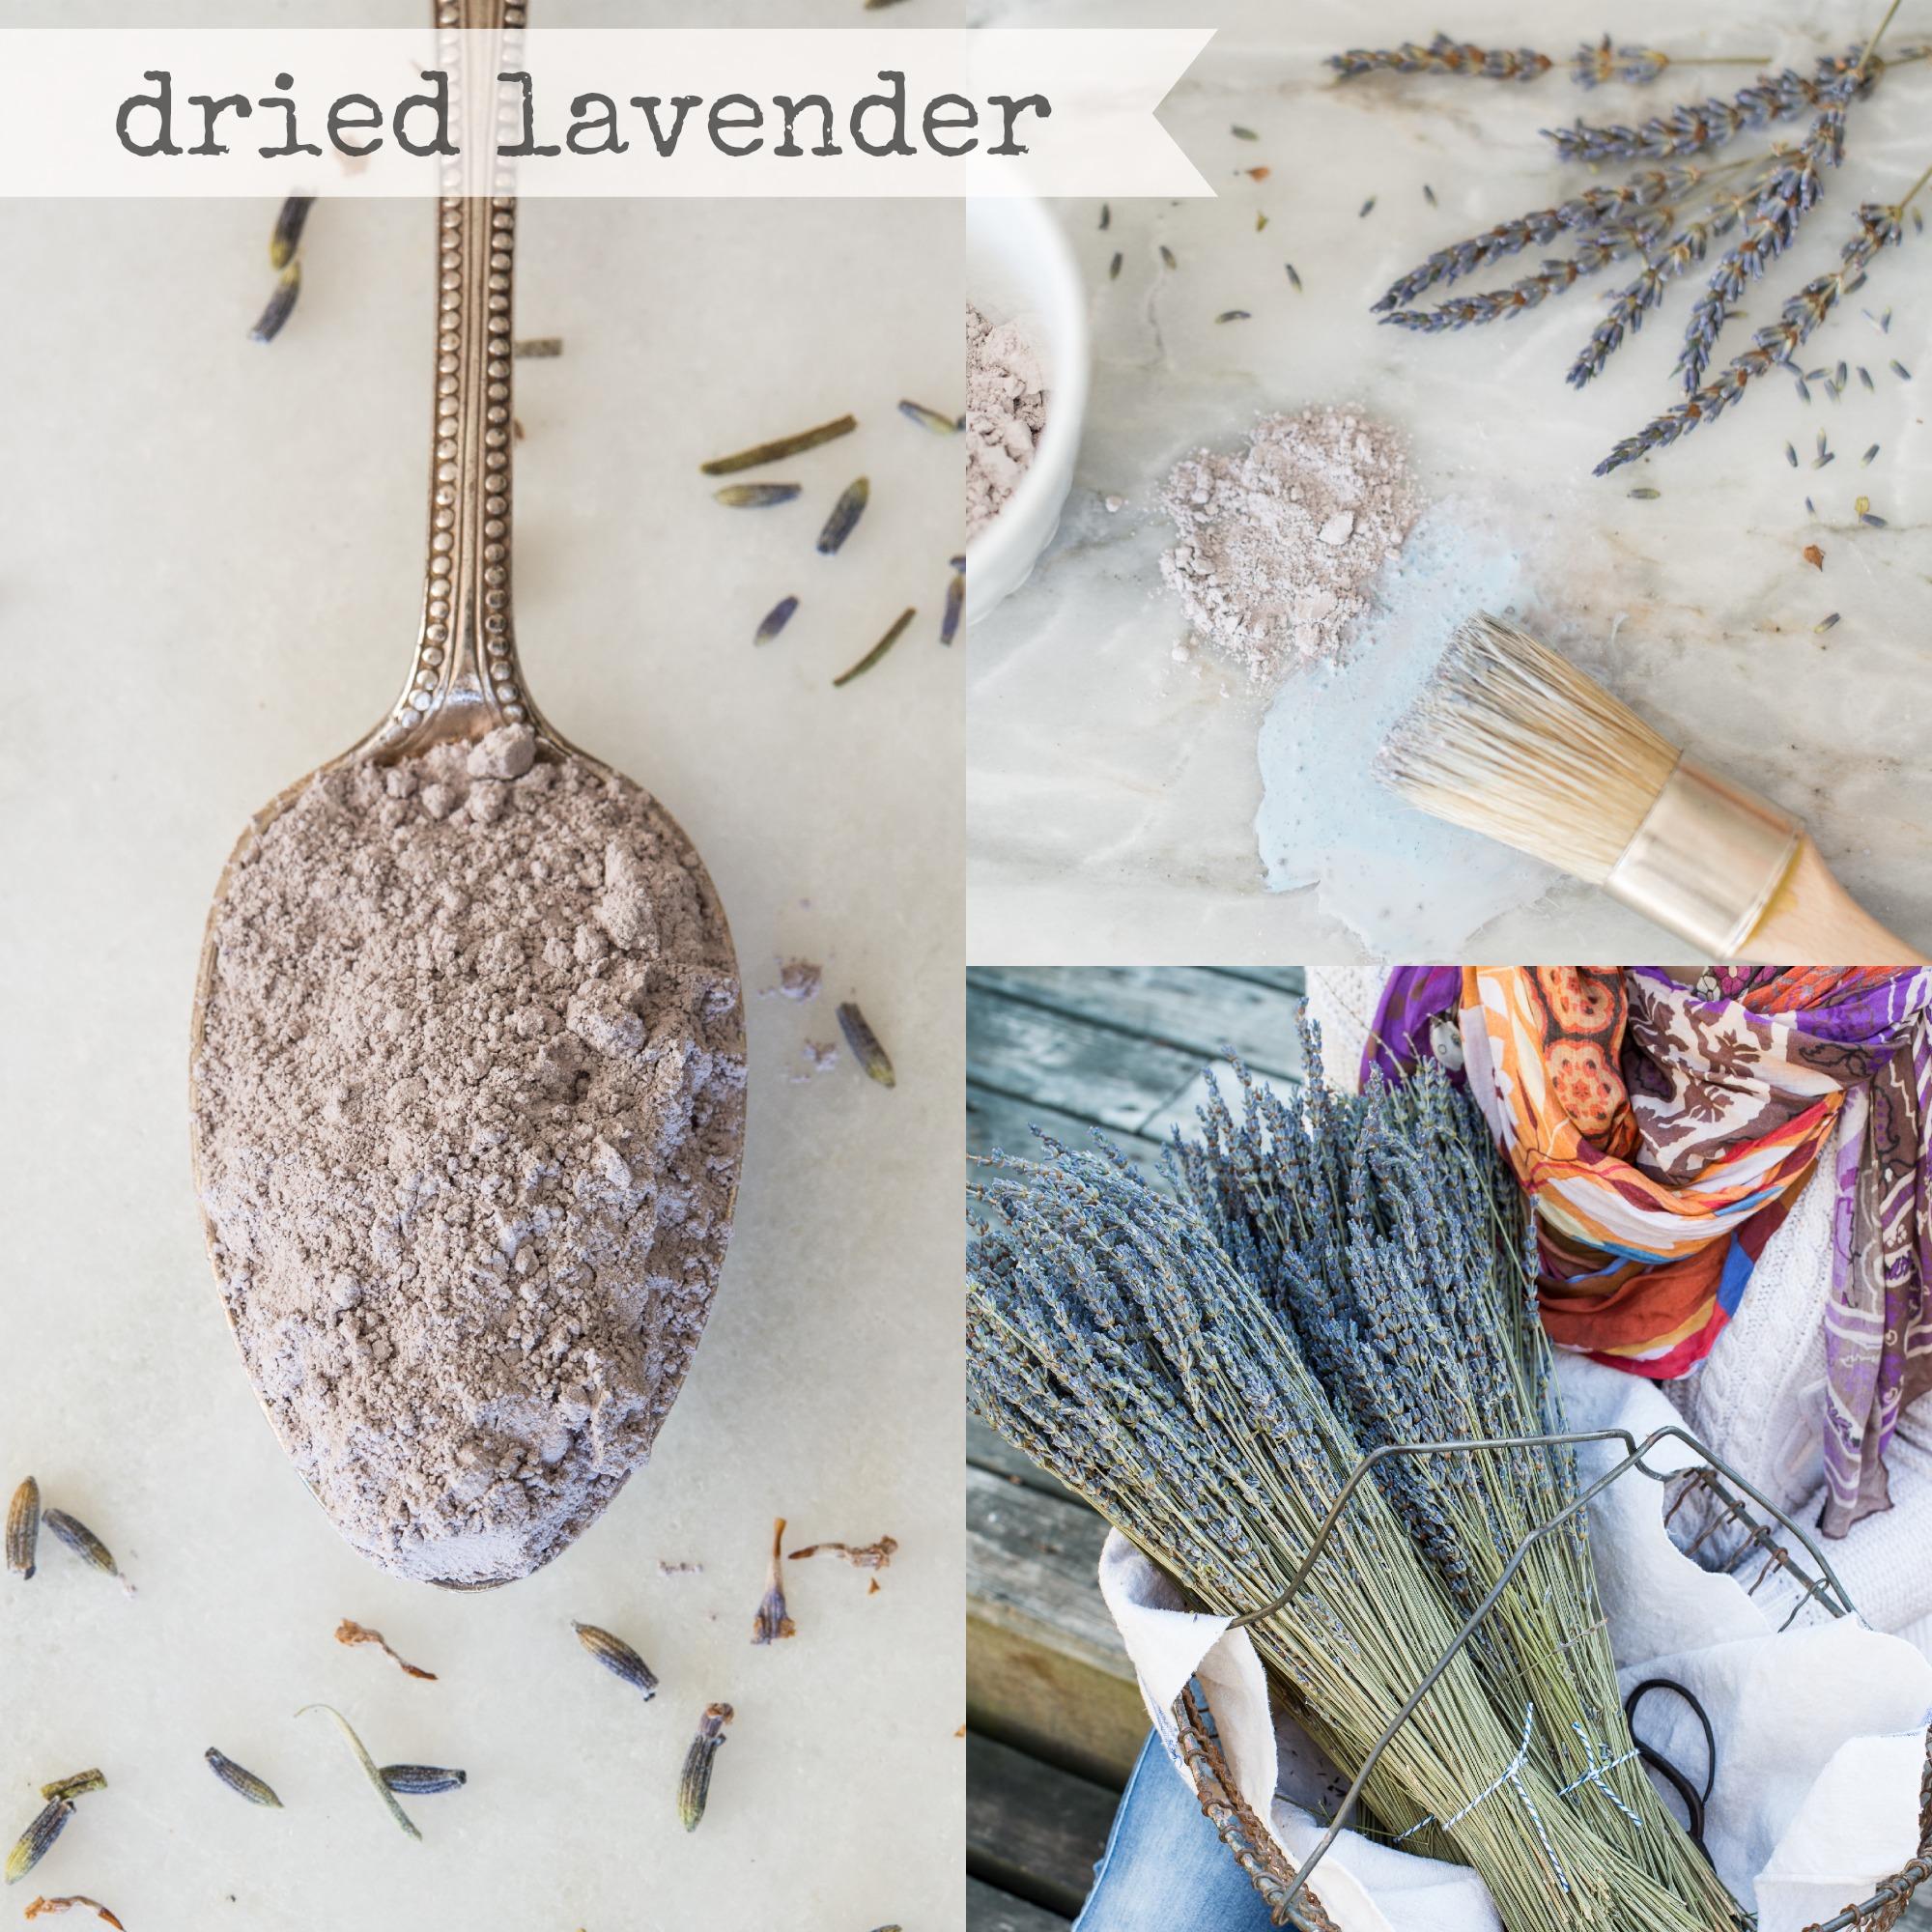 Dried-Lavender-Collage.jpg